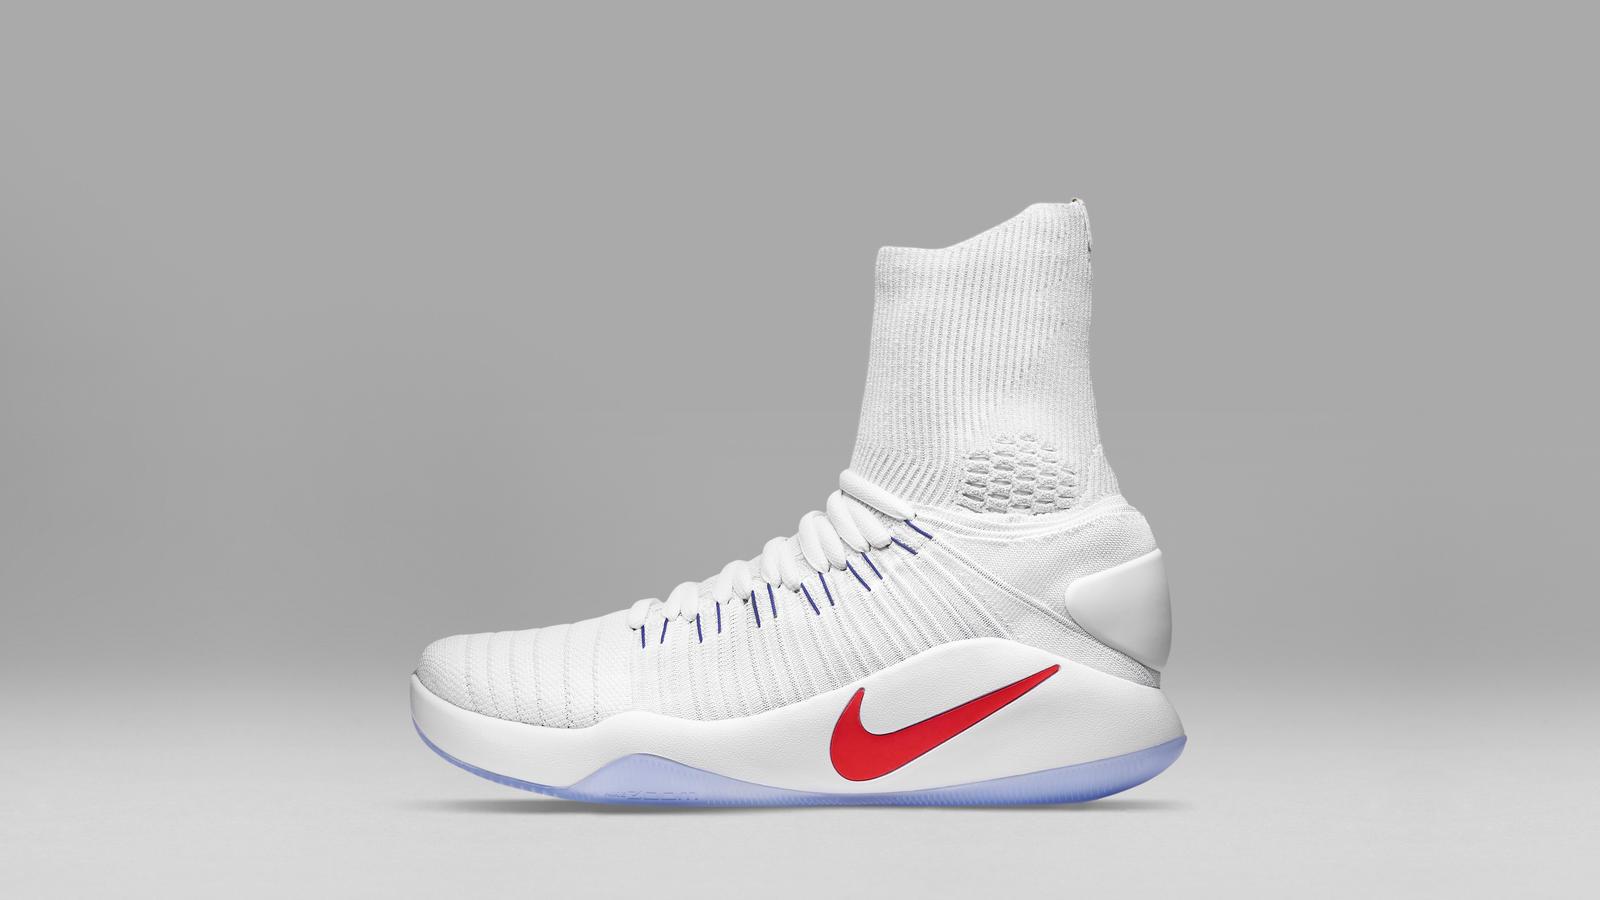 Nike_Hyperdunk_2016_Profile_hd_1600